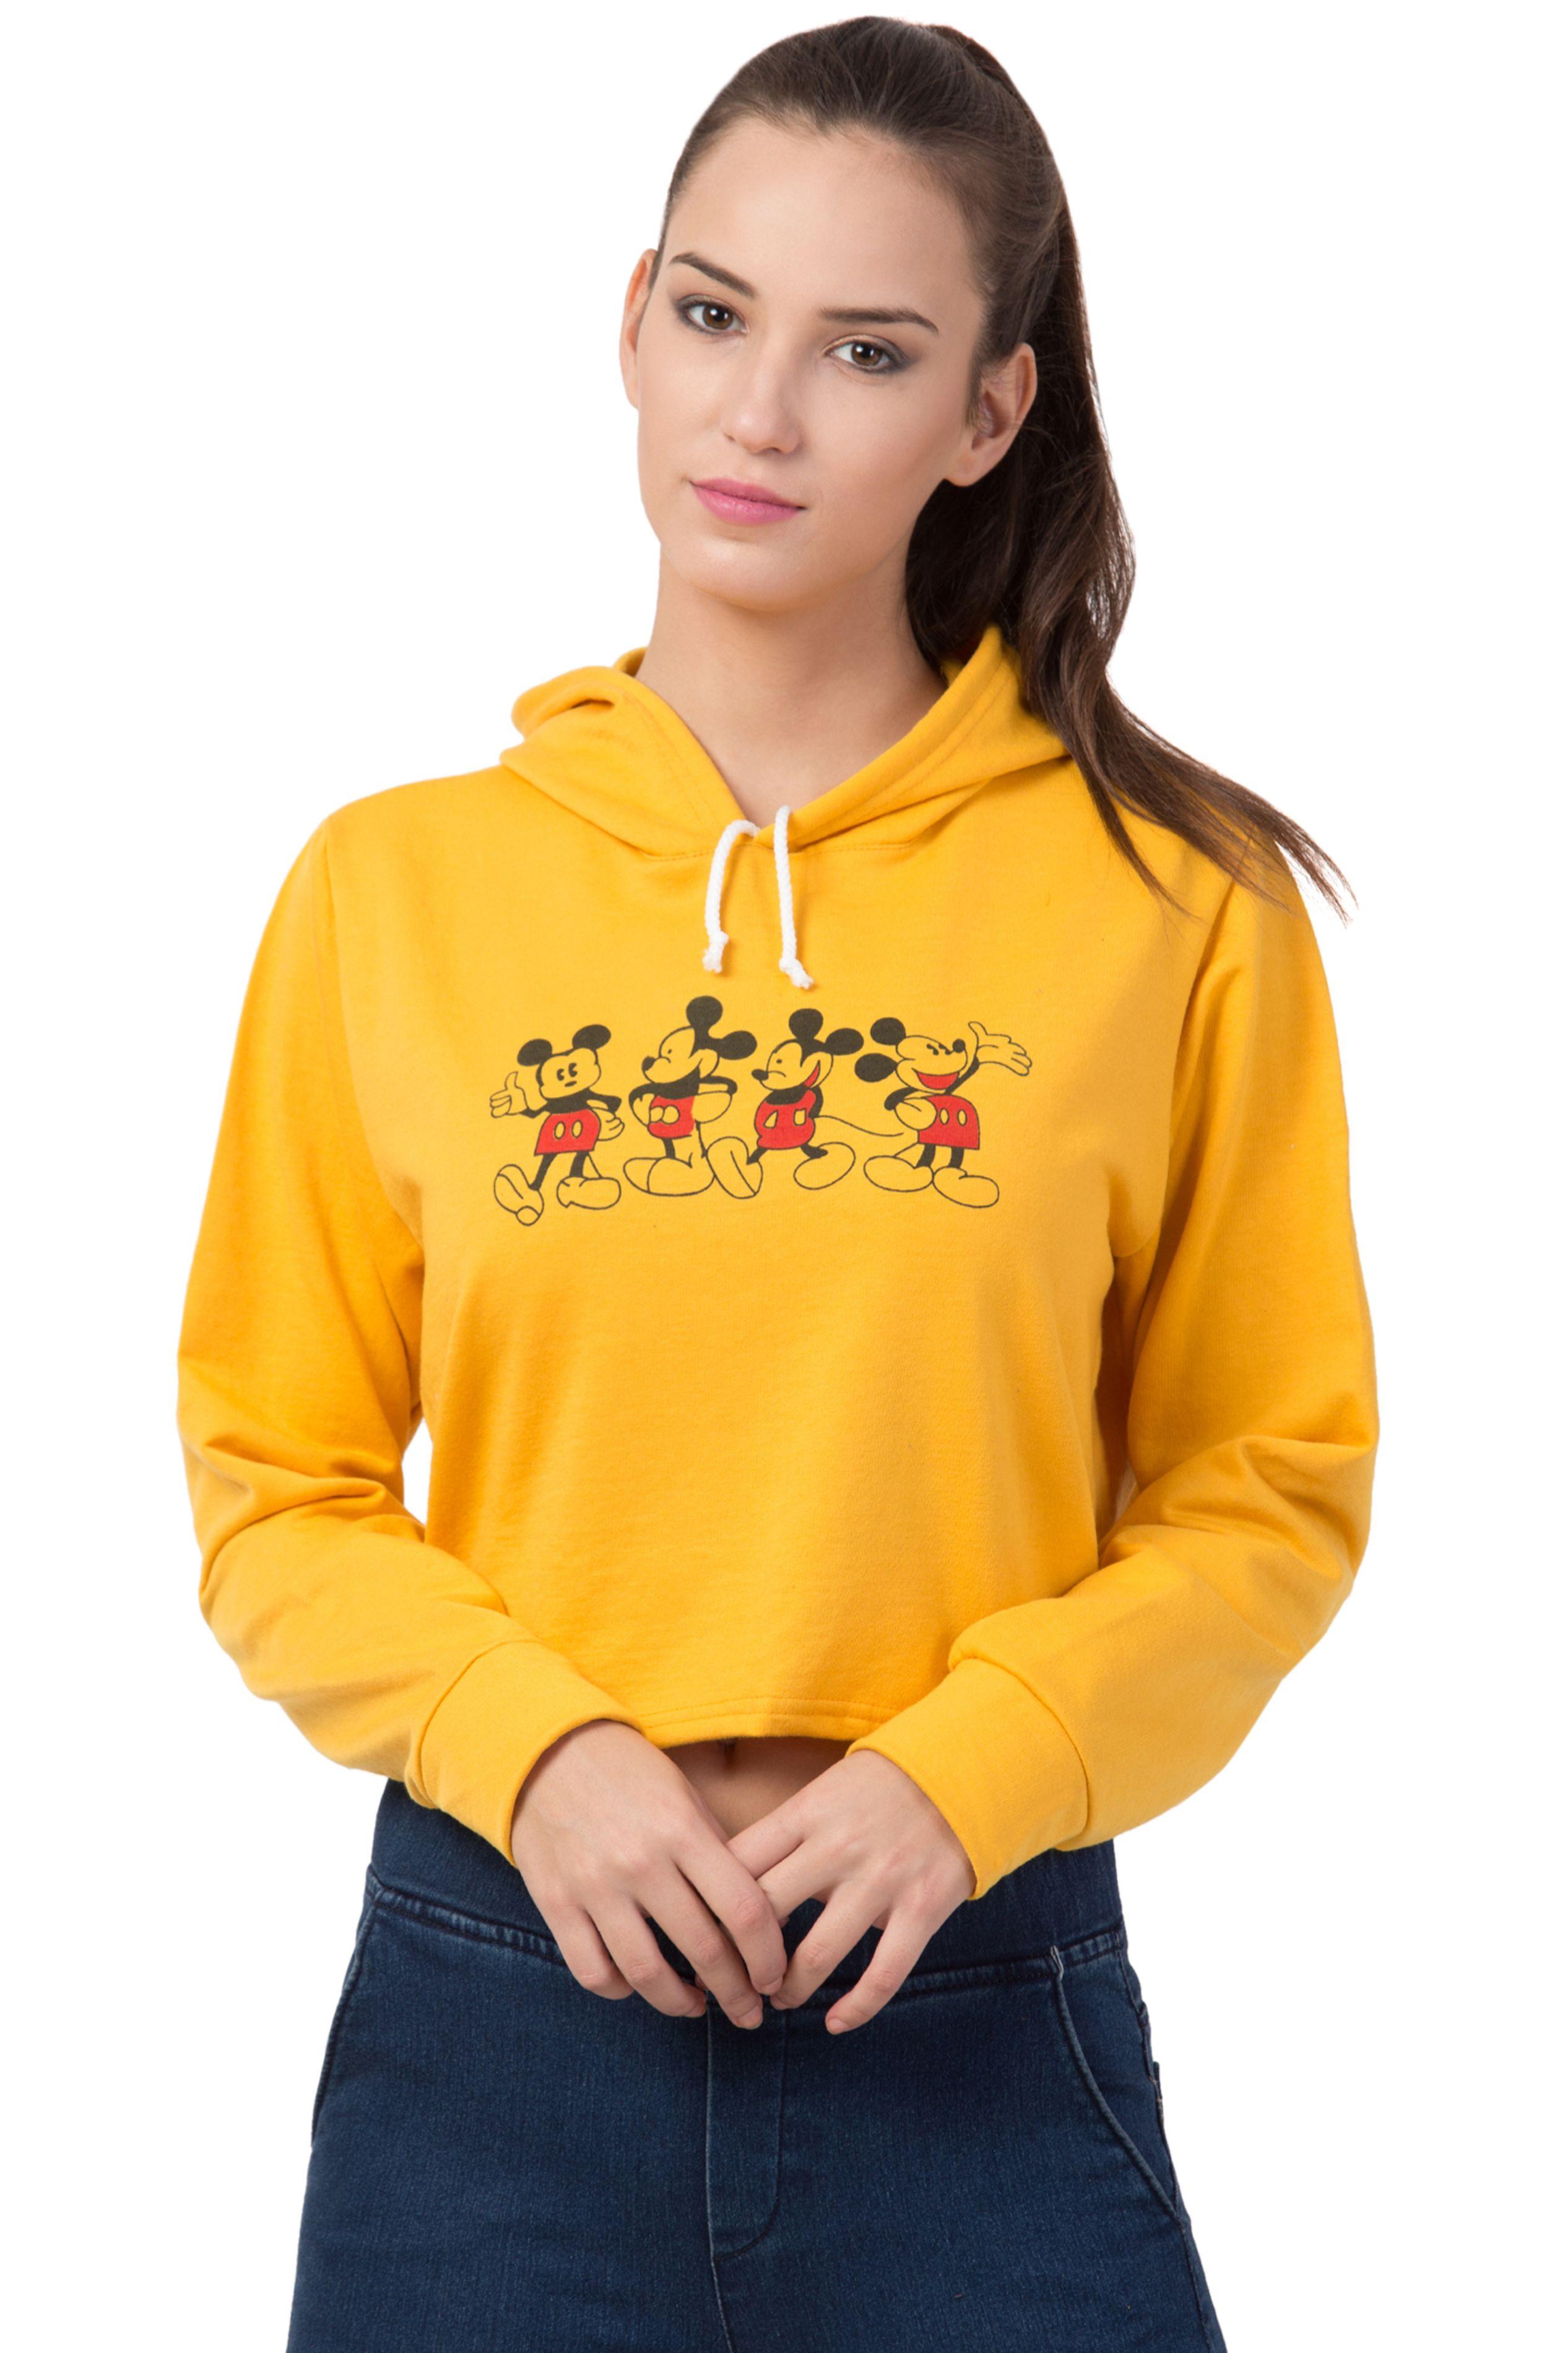 Bestic Fashion Full Sleeve Mickey Printed Women Sweatshirt Hoodies